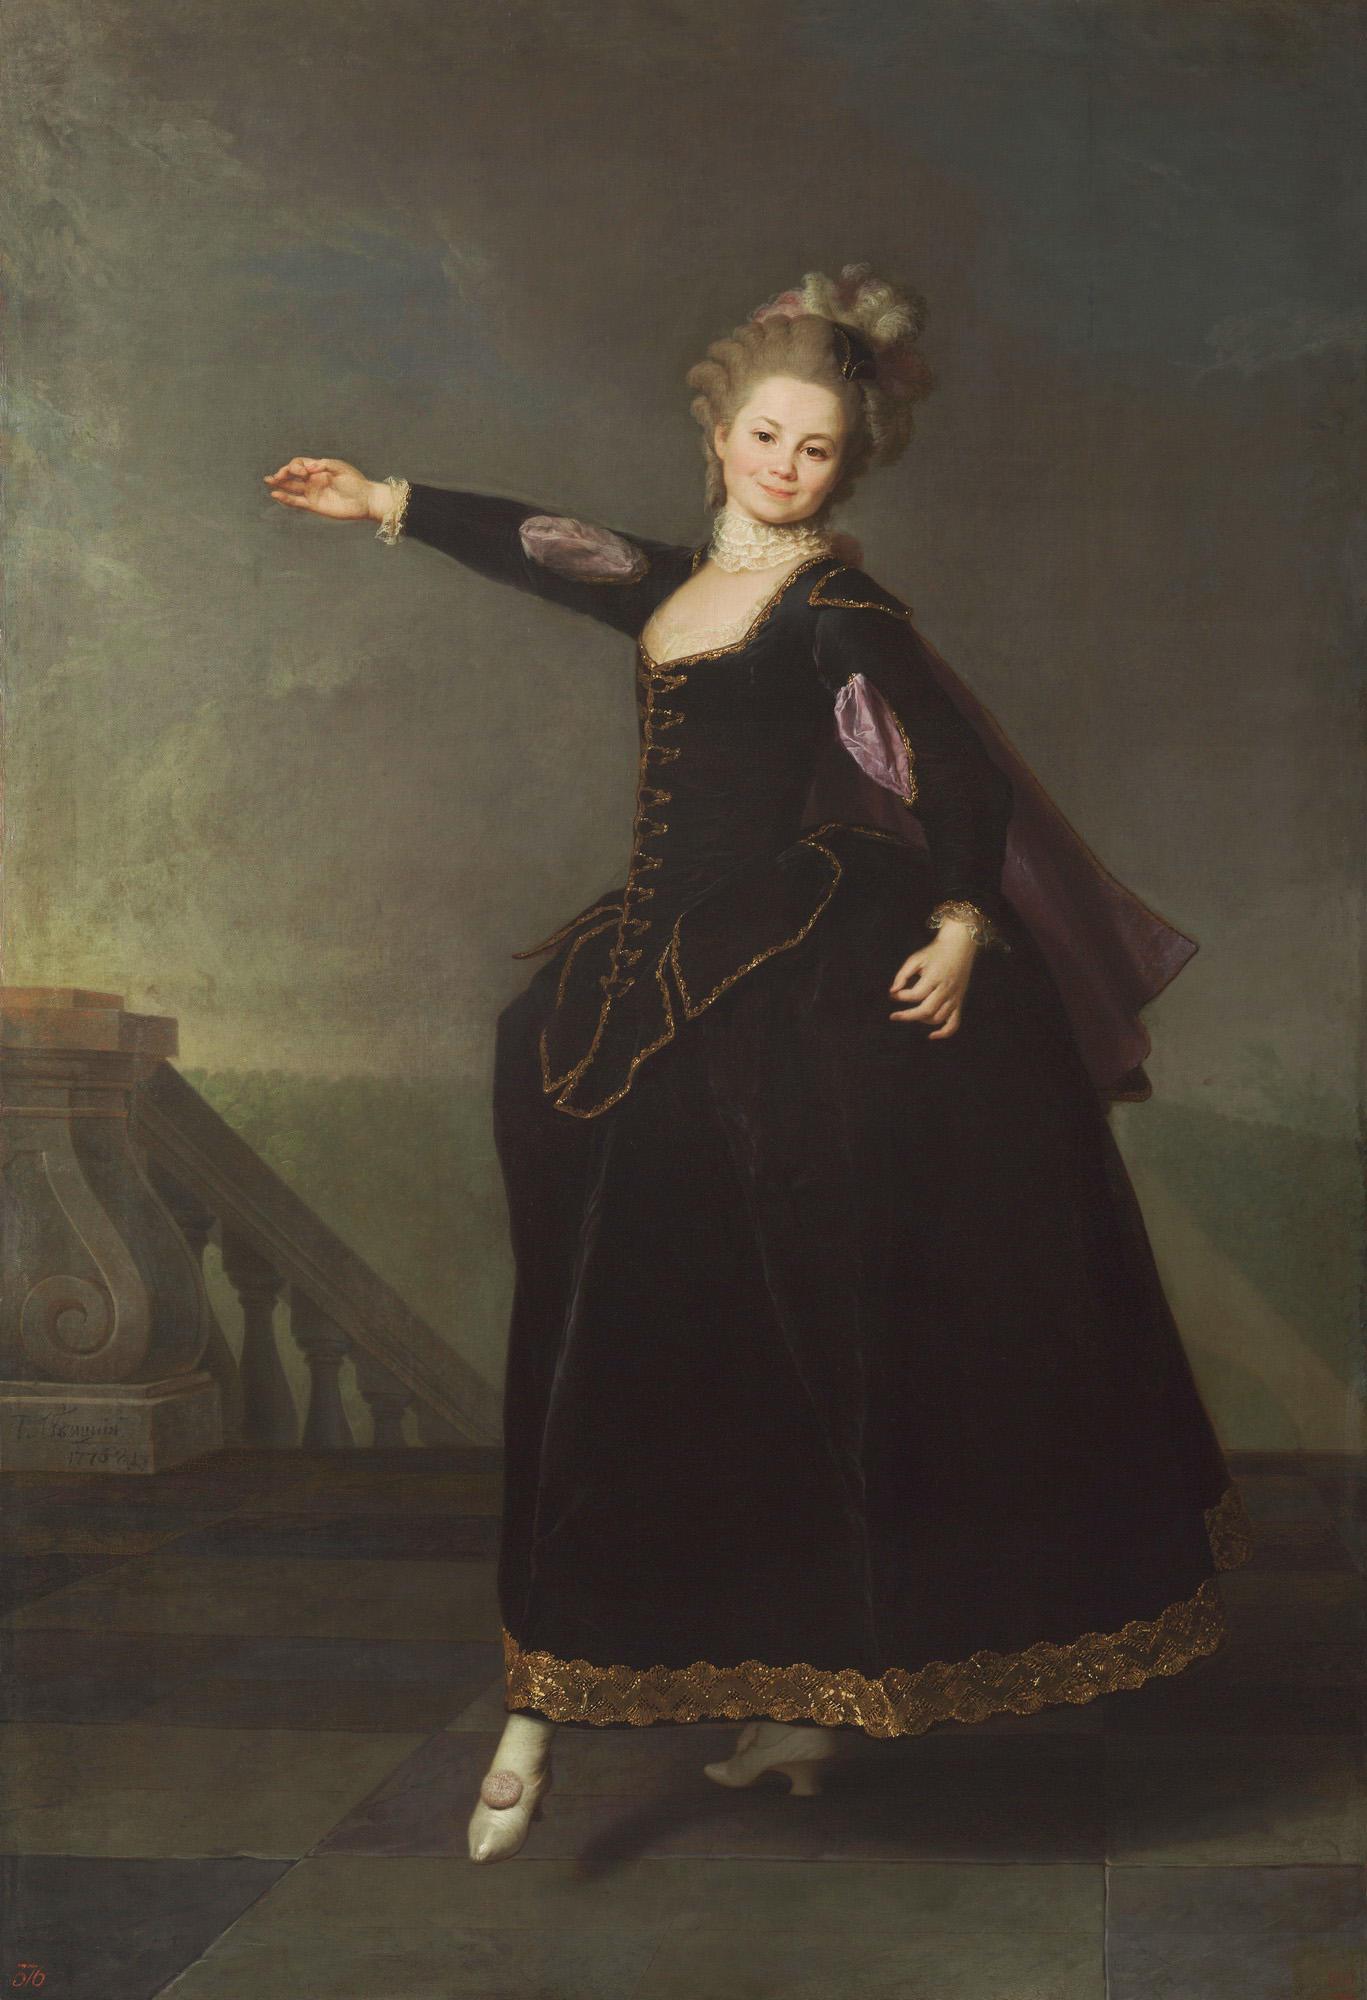 Smolyanki: Dmitry Levitsky, Portrait of Natalia Borschova, 1776, Russian museum, St. Petersburg, Russia.